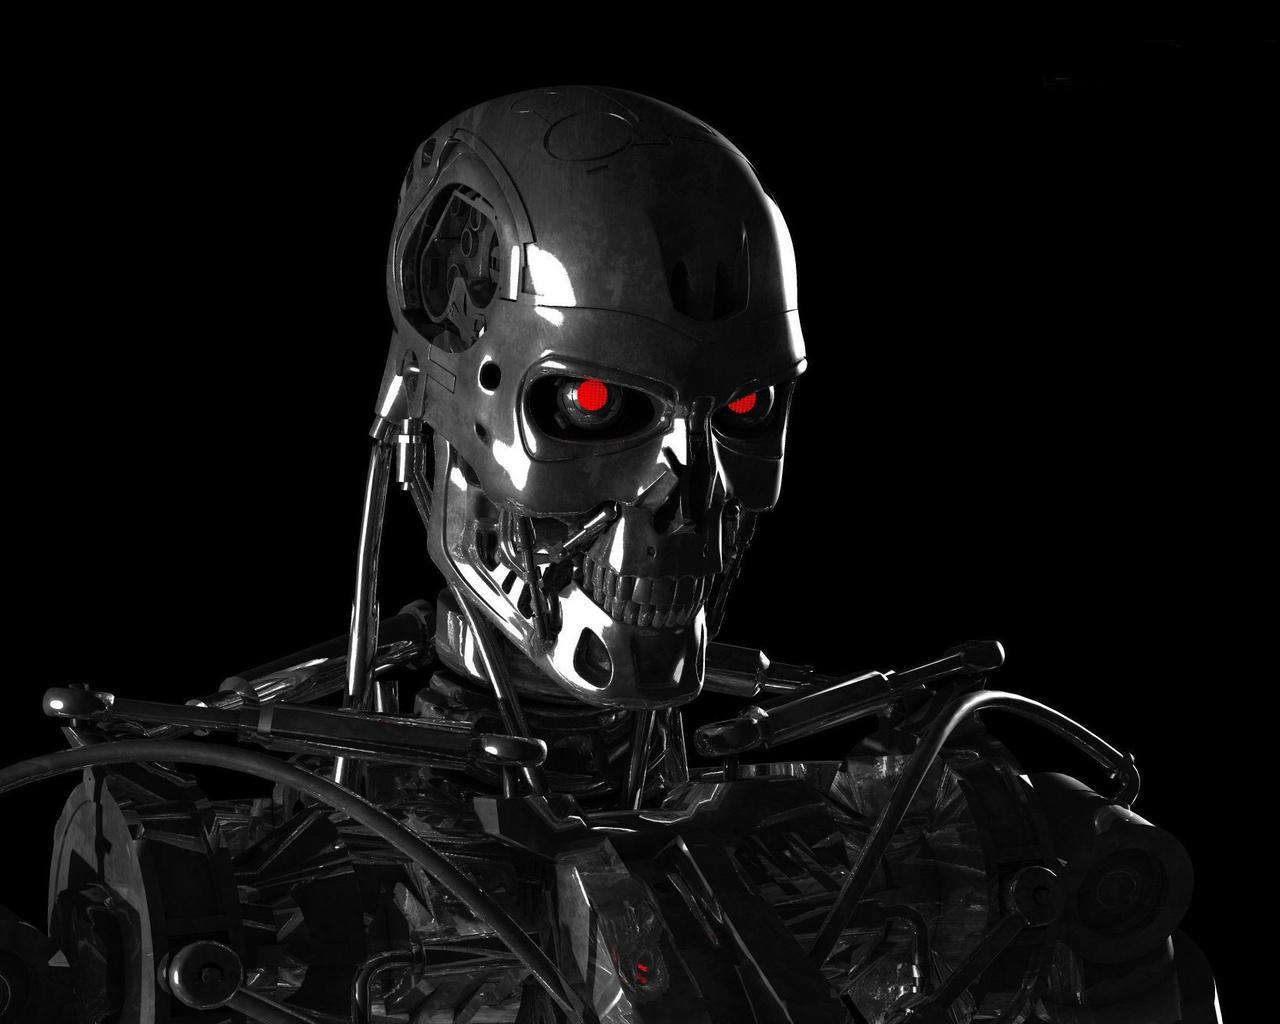 терминатор, Киборг, робот